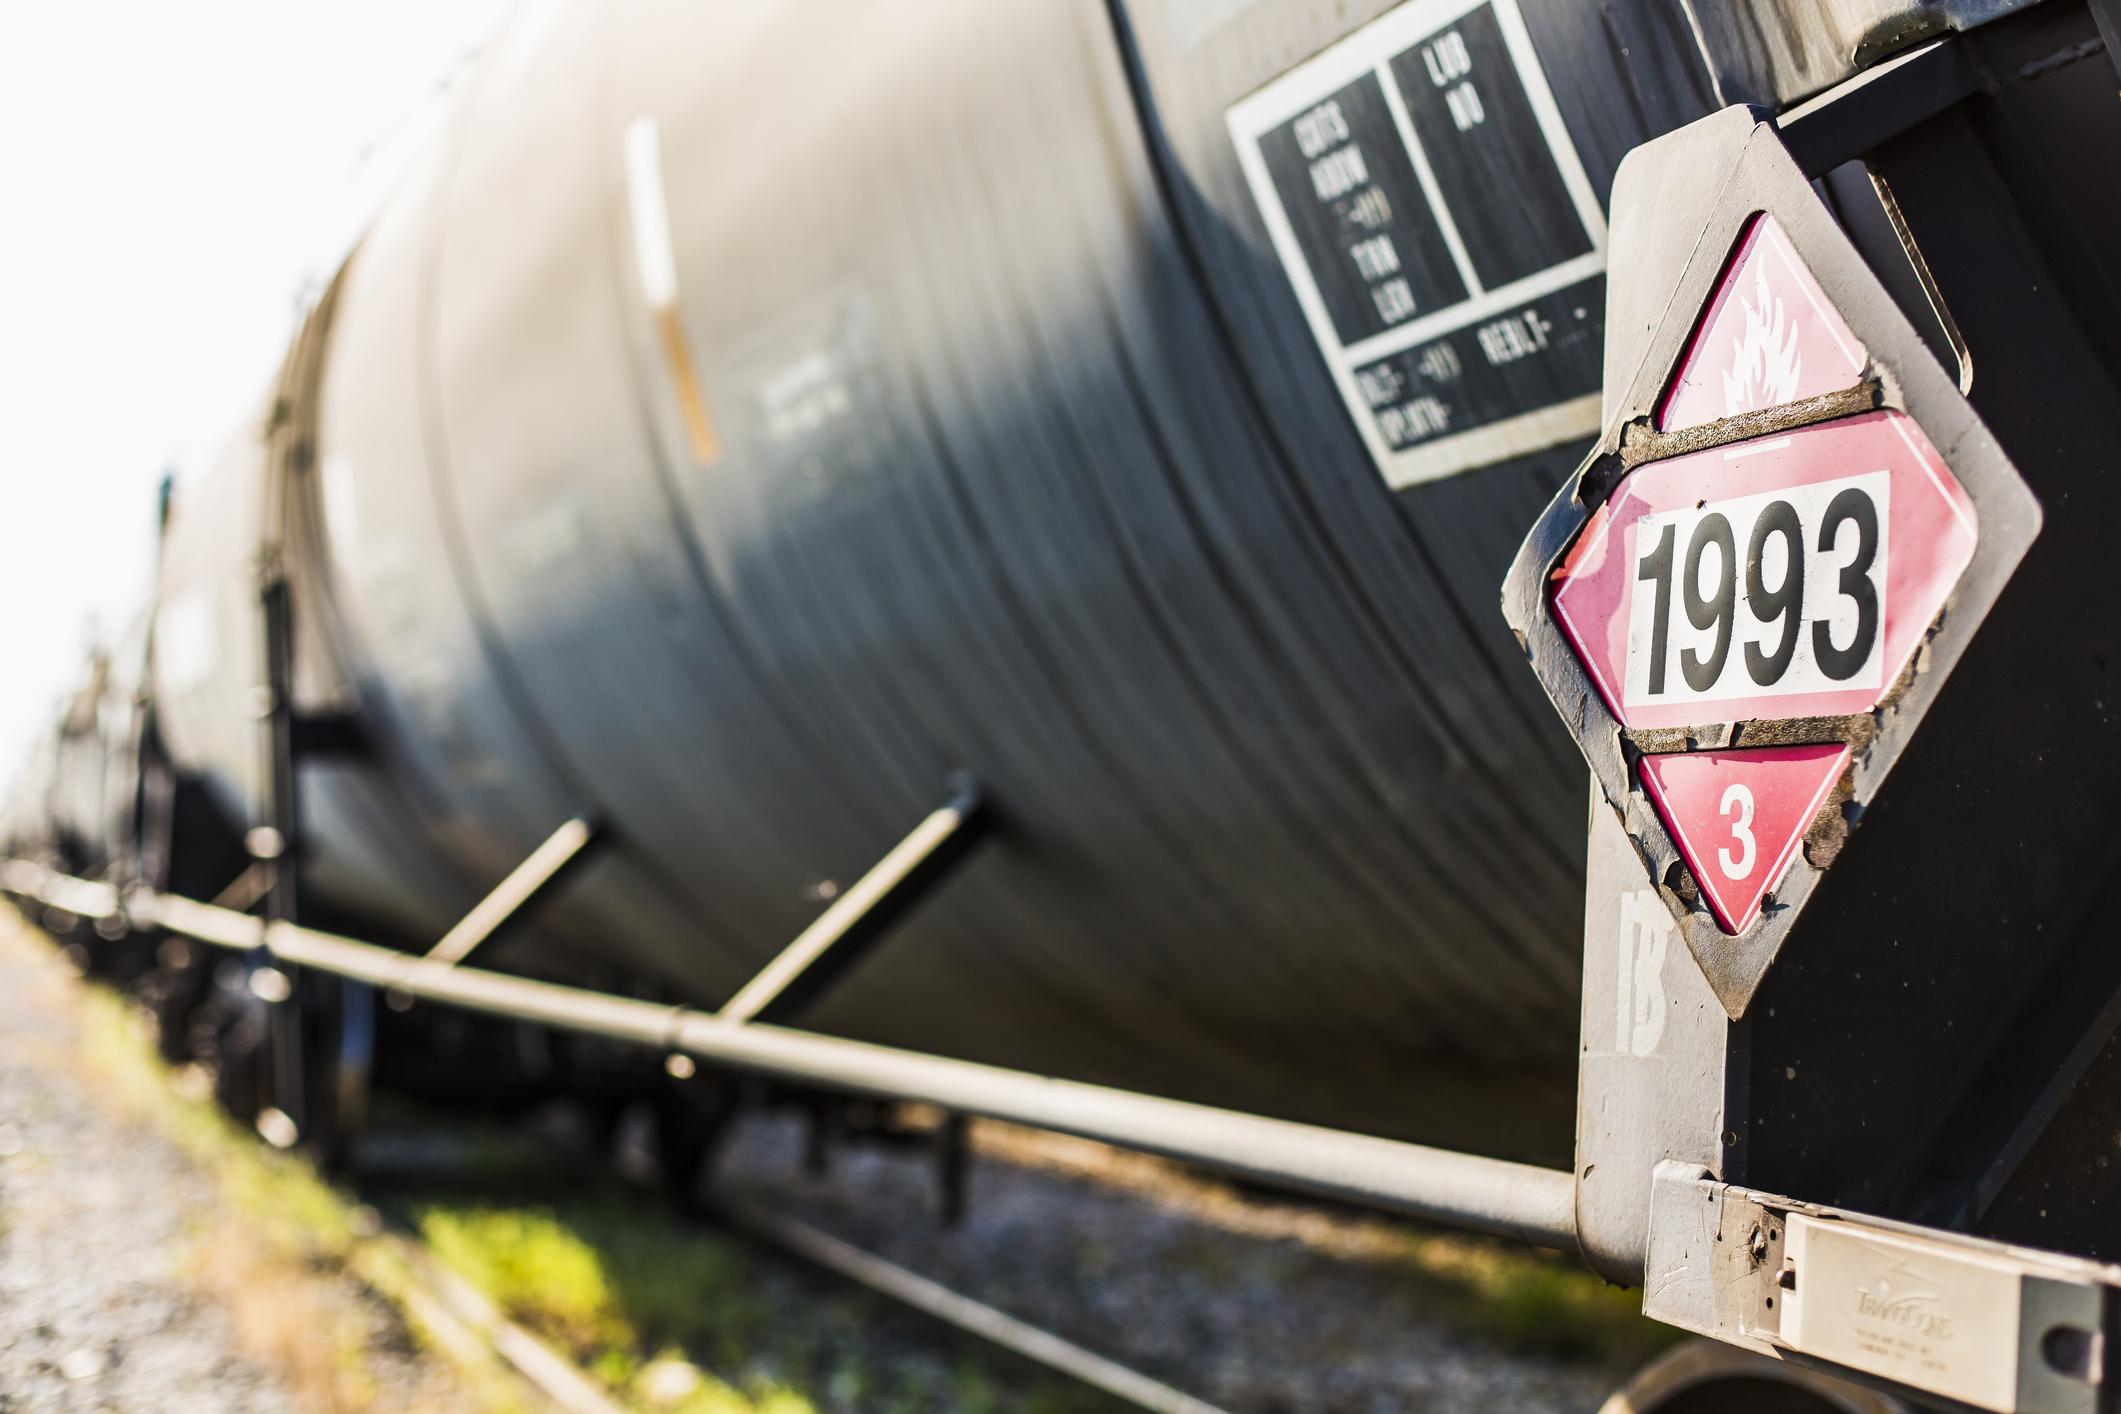 A closeup of an oil tank car focused on a hazardous material sign 1993 denoting flammable liquids.